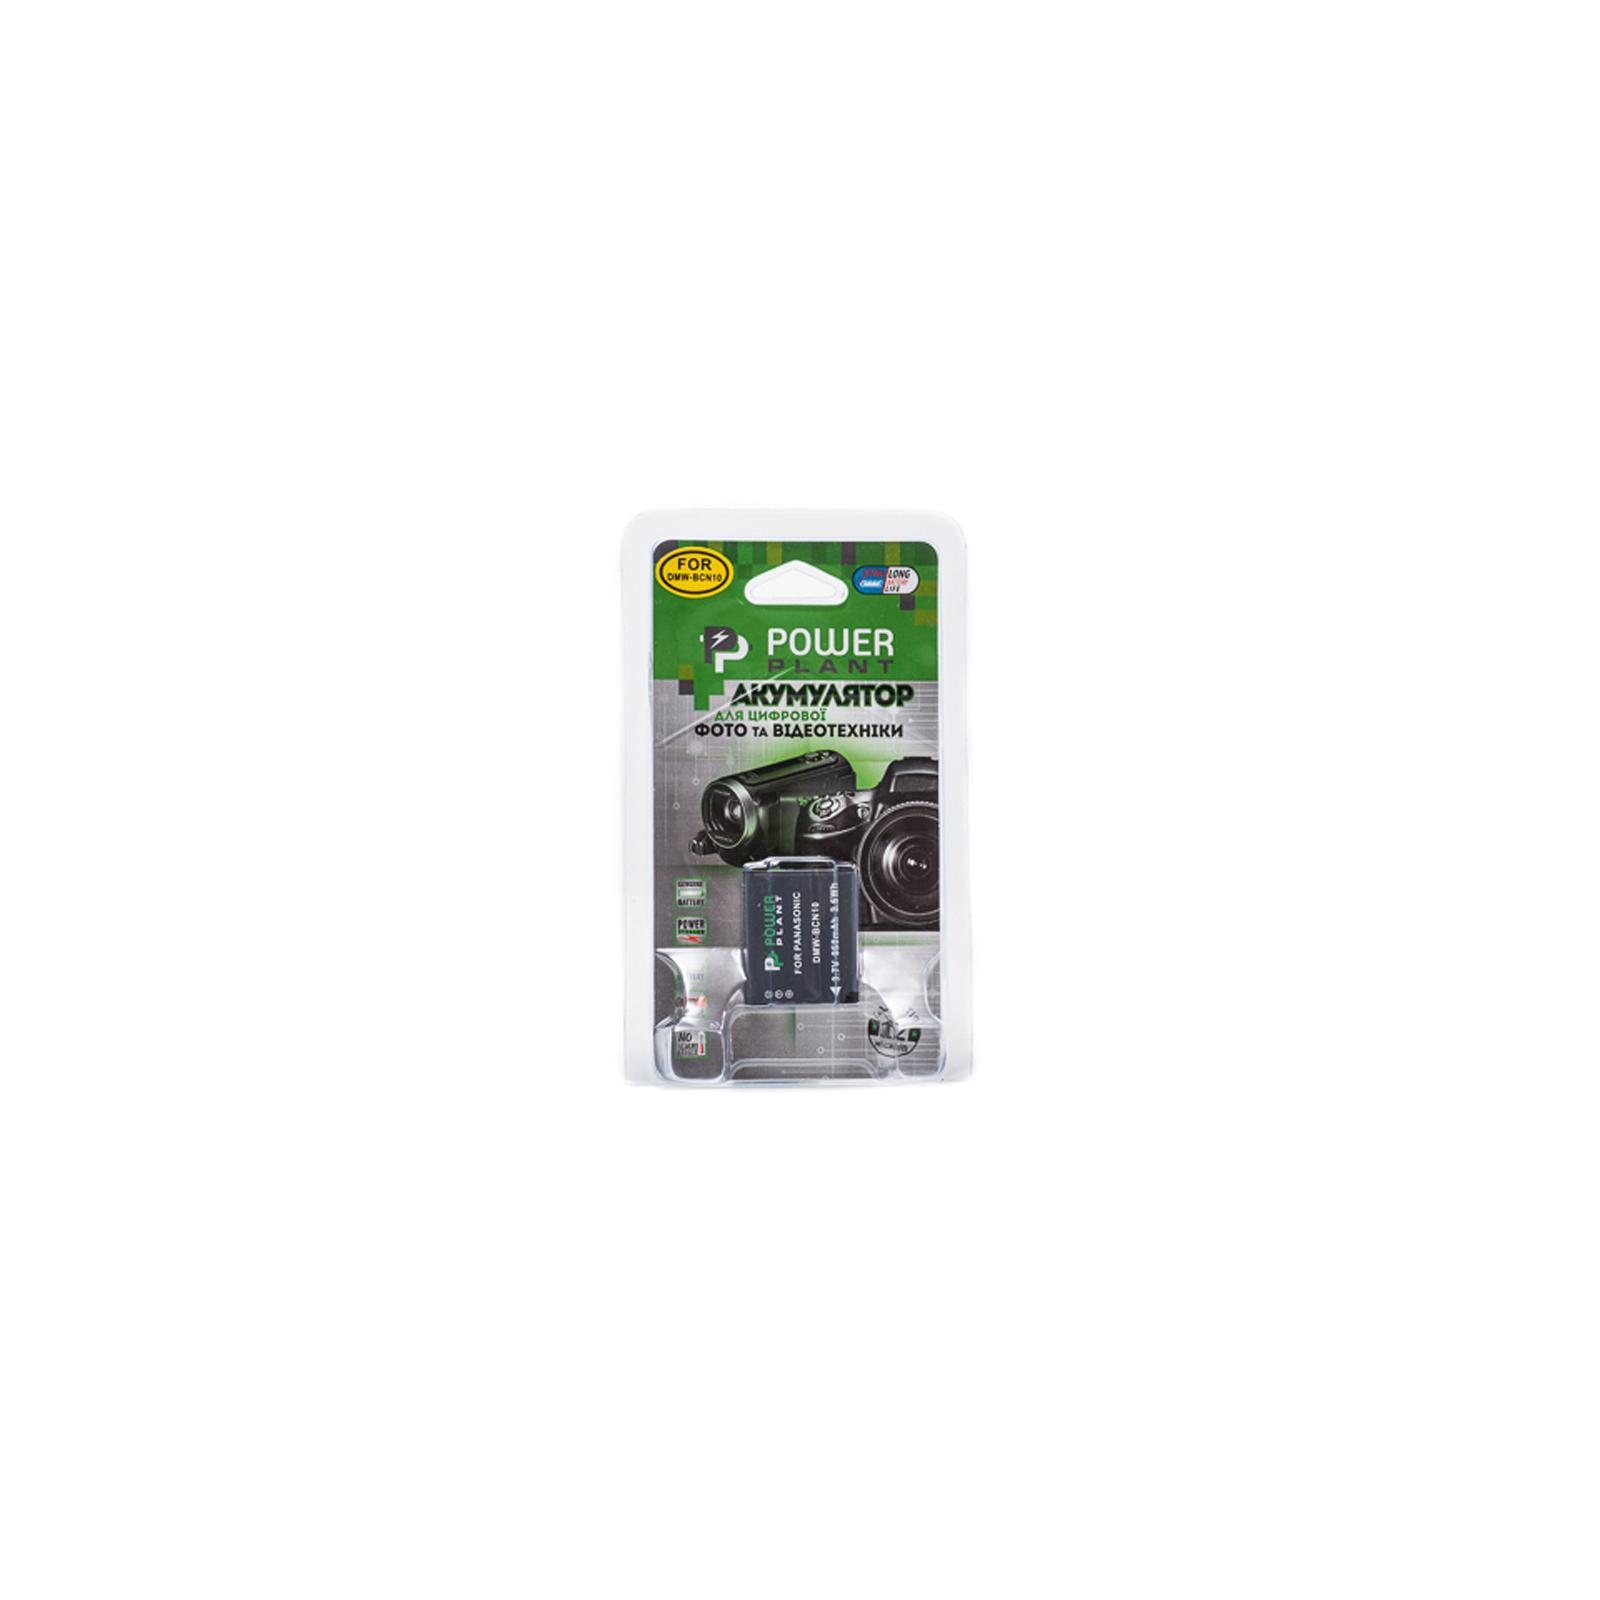 Аккумулятор к фото/видео PowerPlant Panasonic DMW-BCN10 (DV00DV1378) изображение 3